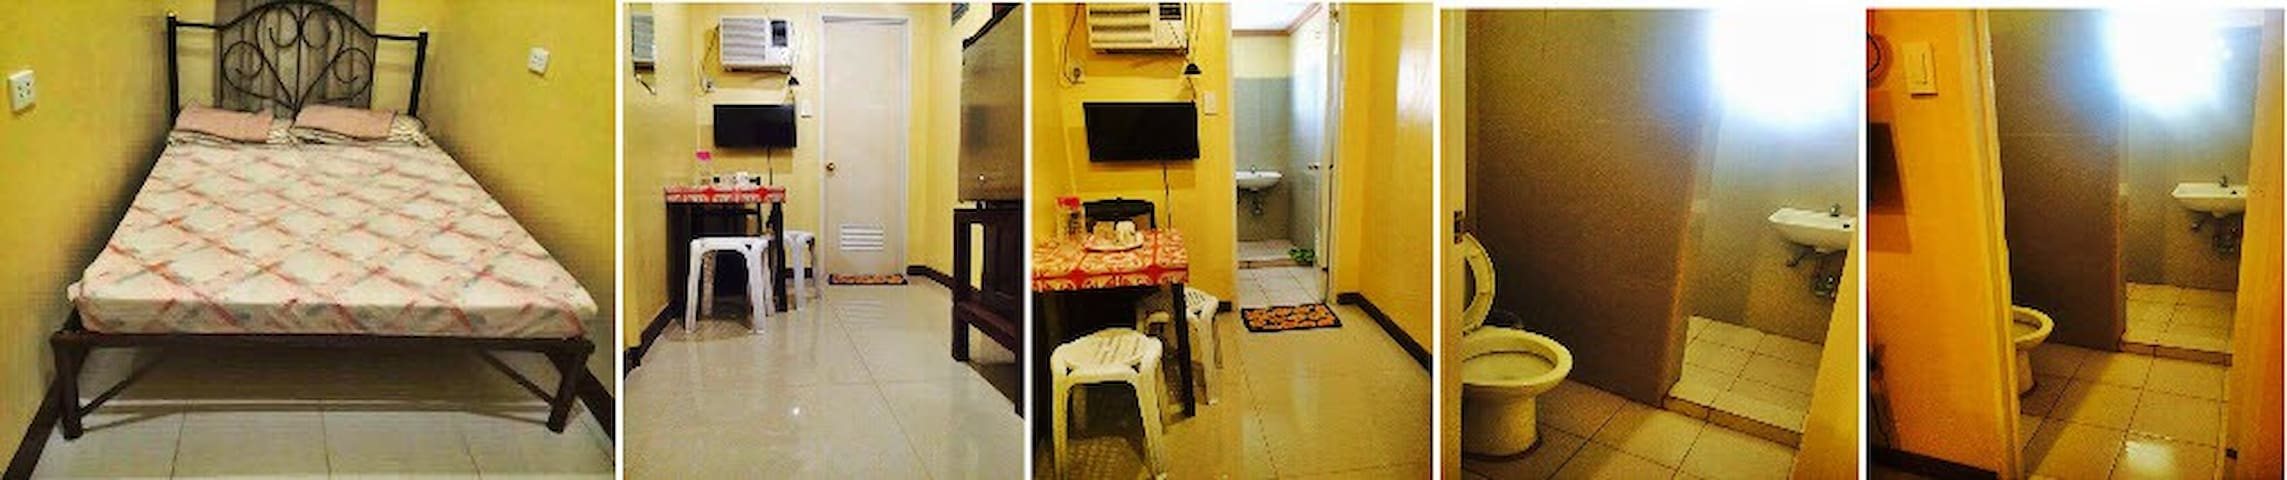 Matilde's House - 2 pax room near Mactan Airport - Lapu-Lapu City - Ev